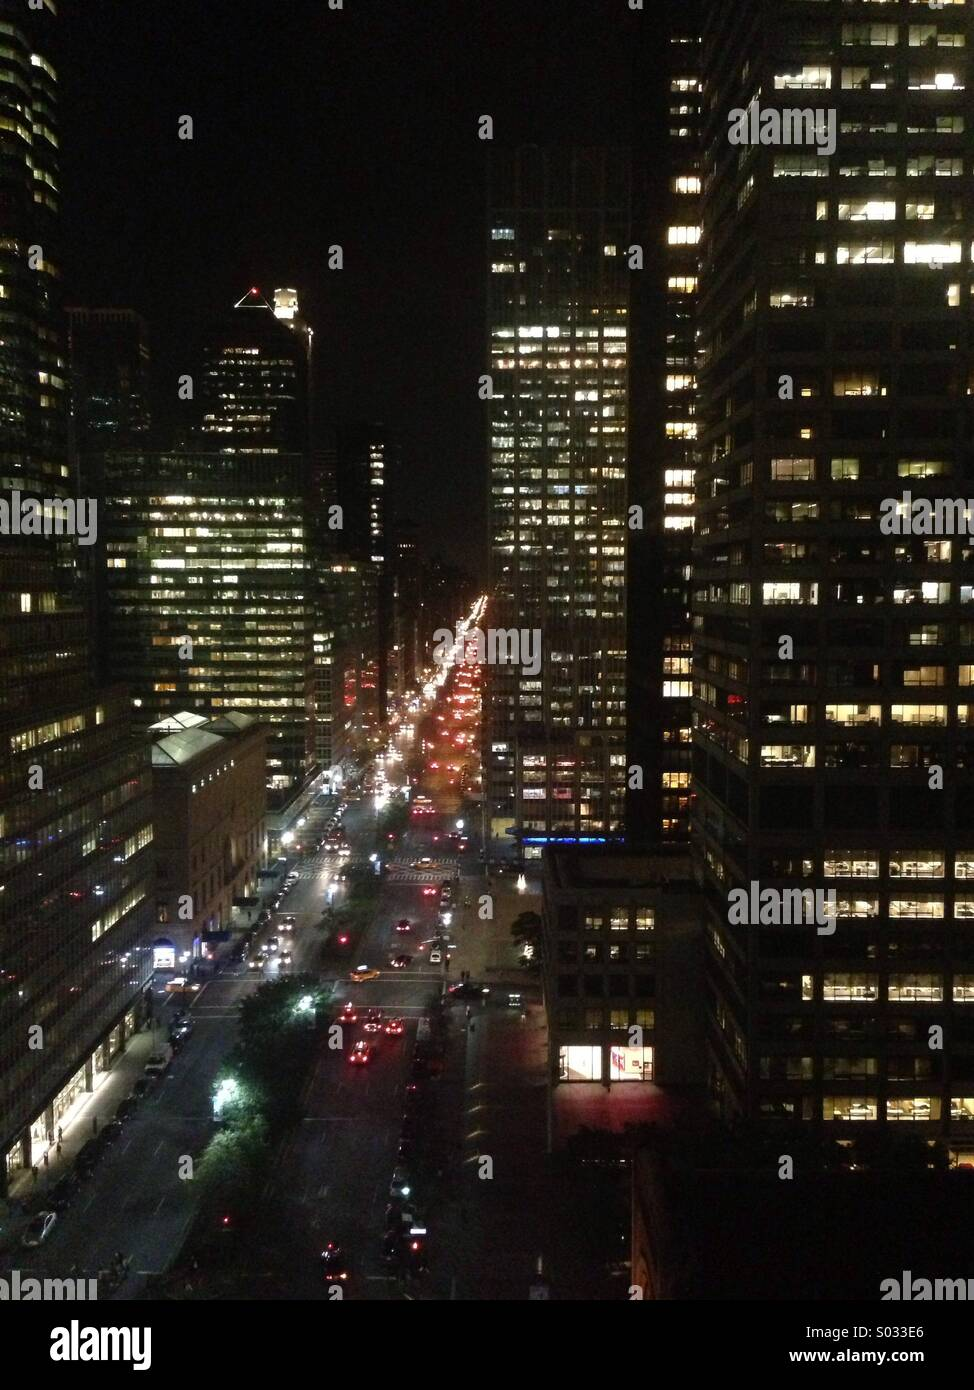 New York sky scrapers at night - Stock Image